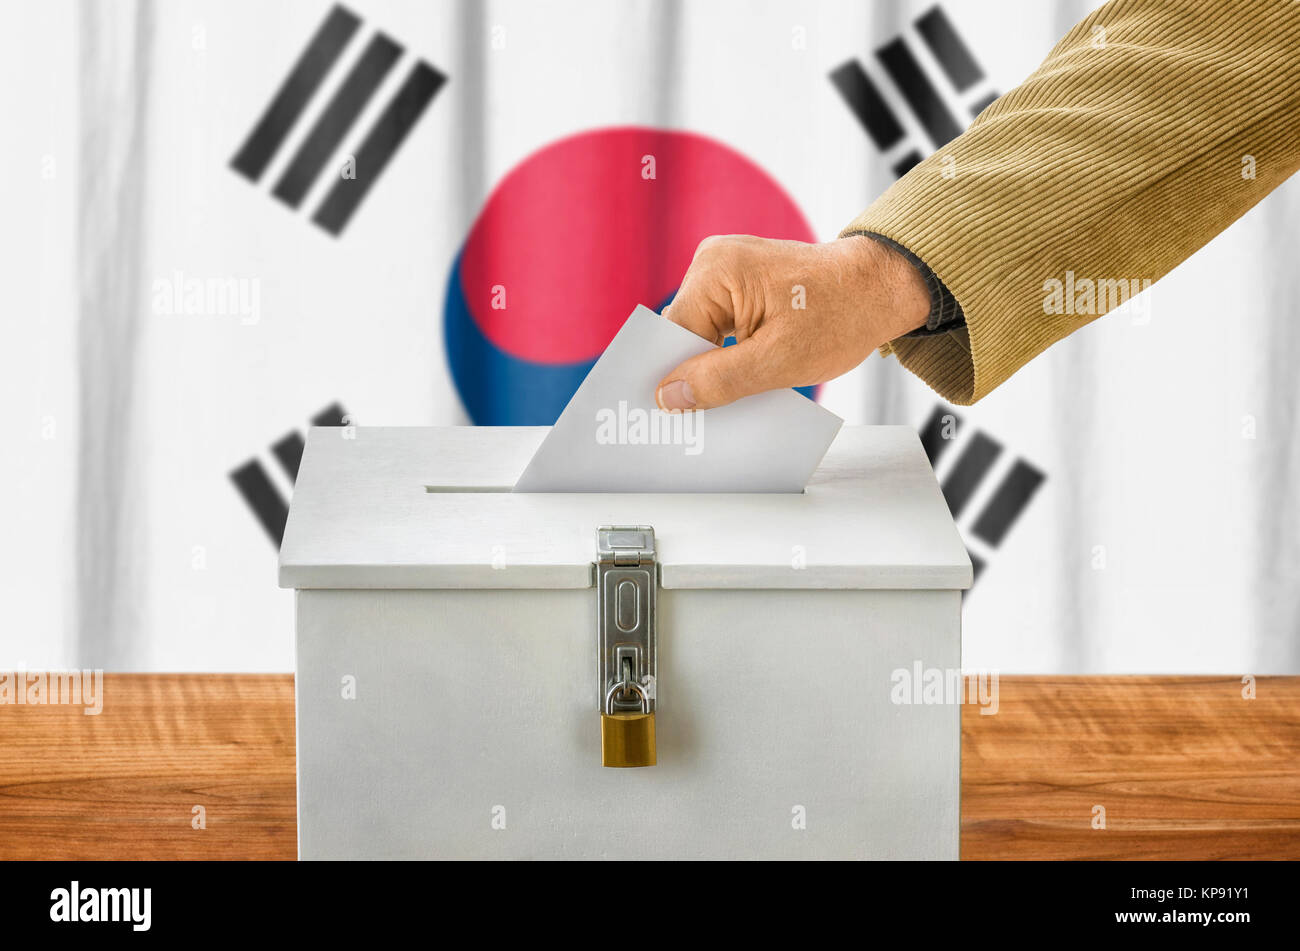 man putting ballot in the ballot box - south korea - Stock Image